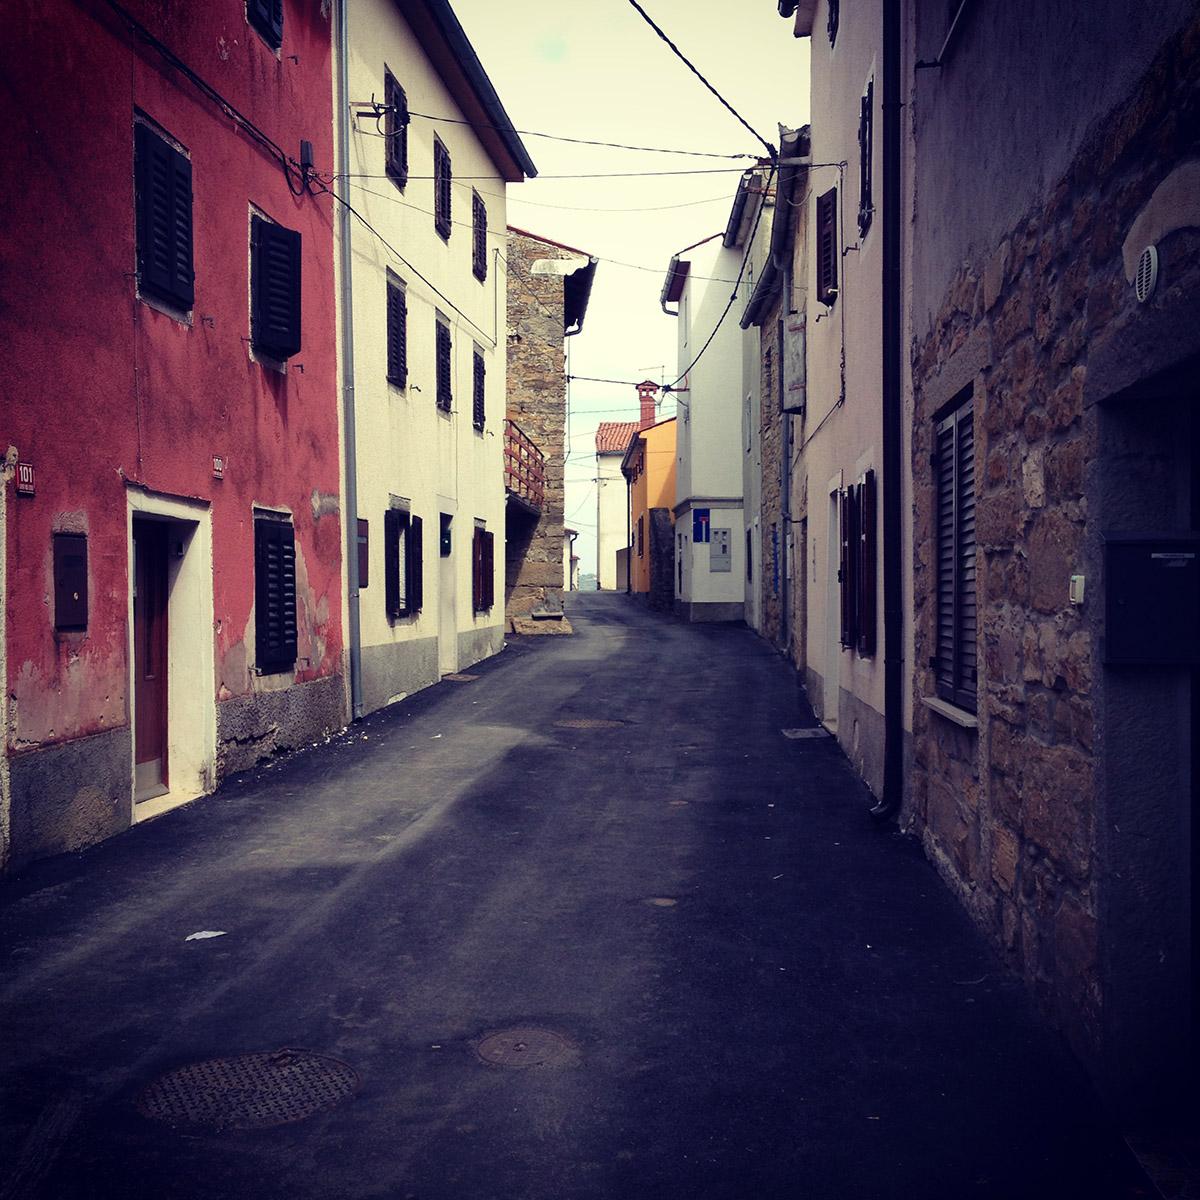 Daily Photo: narrow Alley in Korte, Slovenia